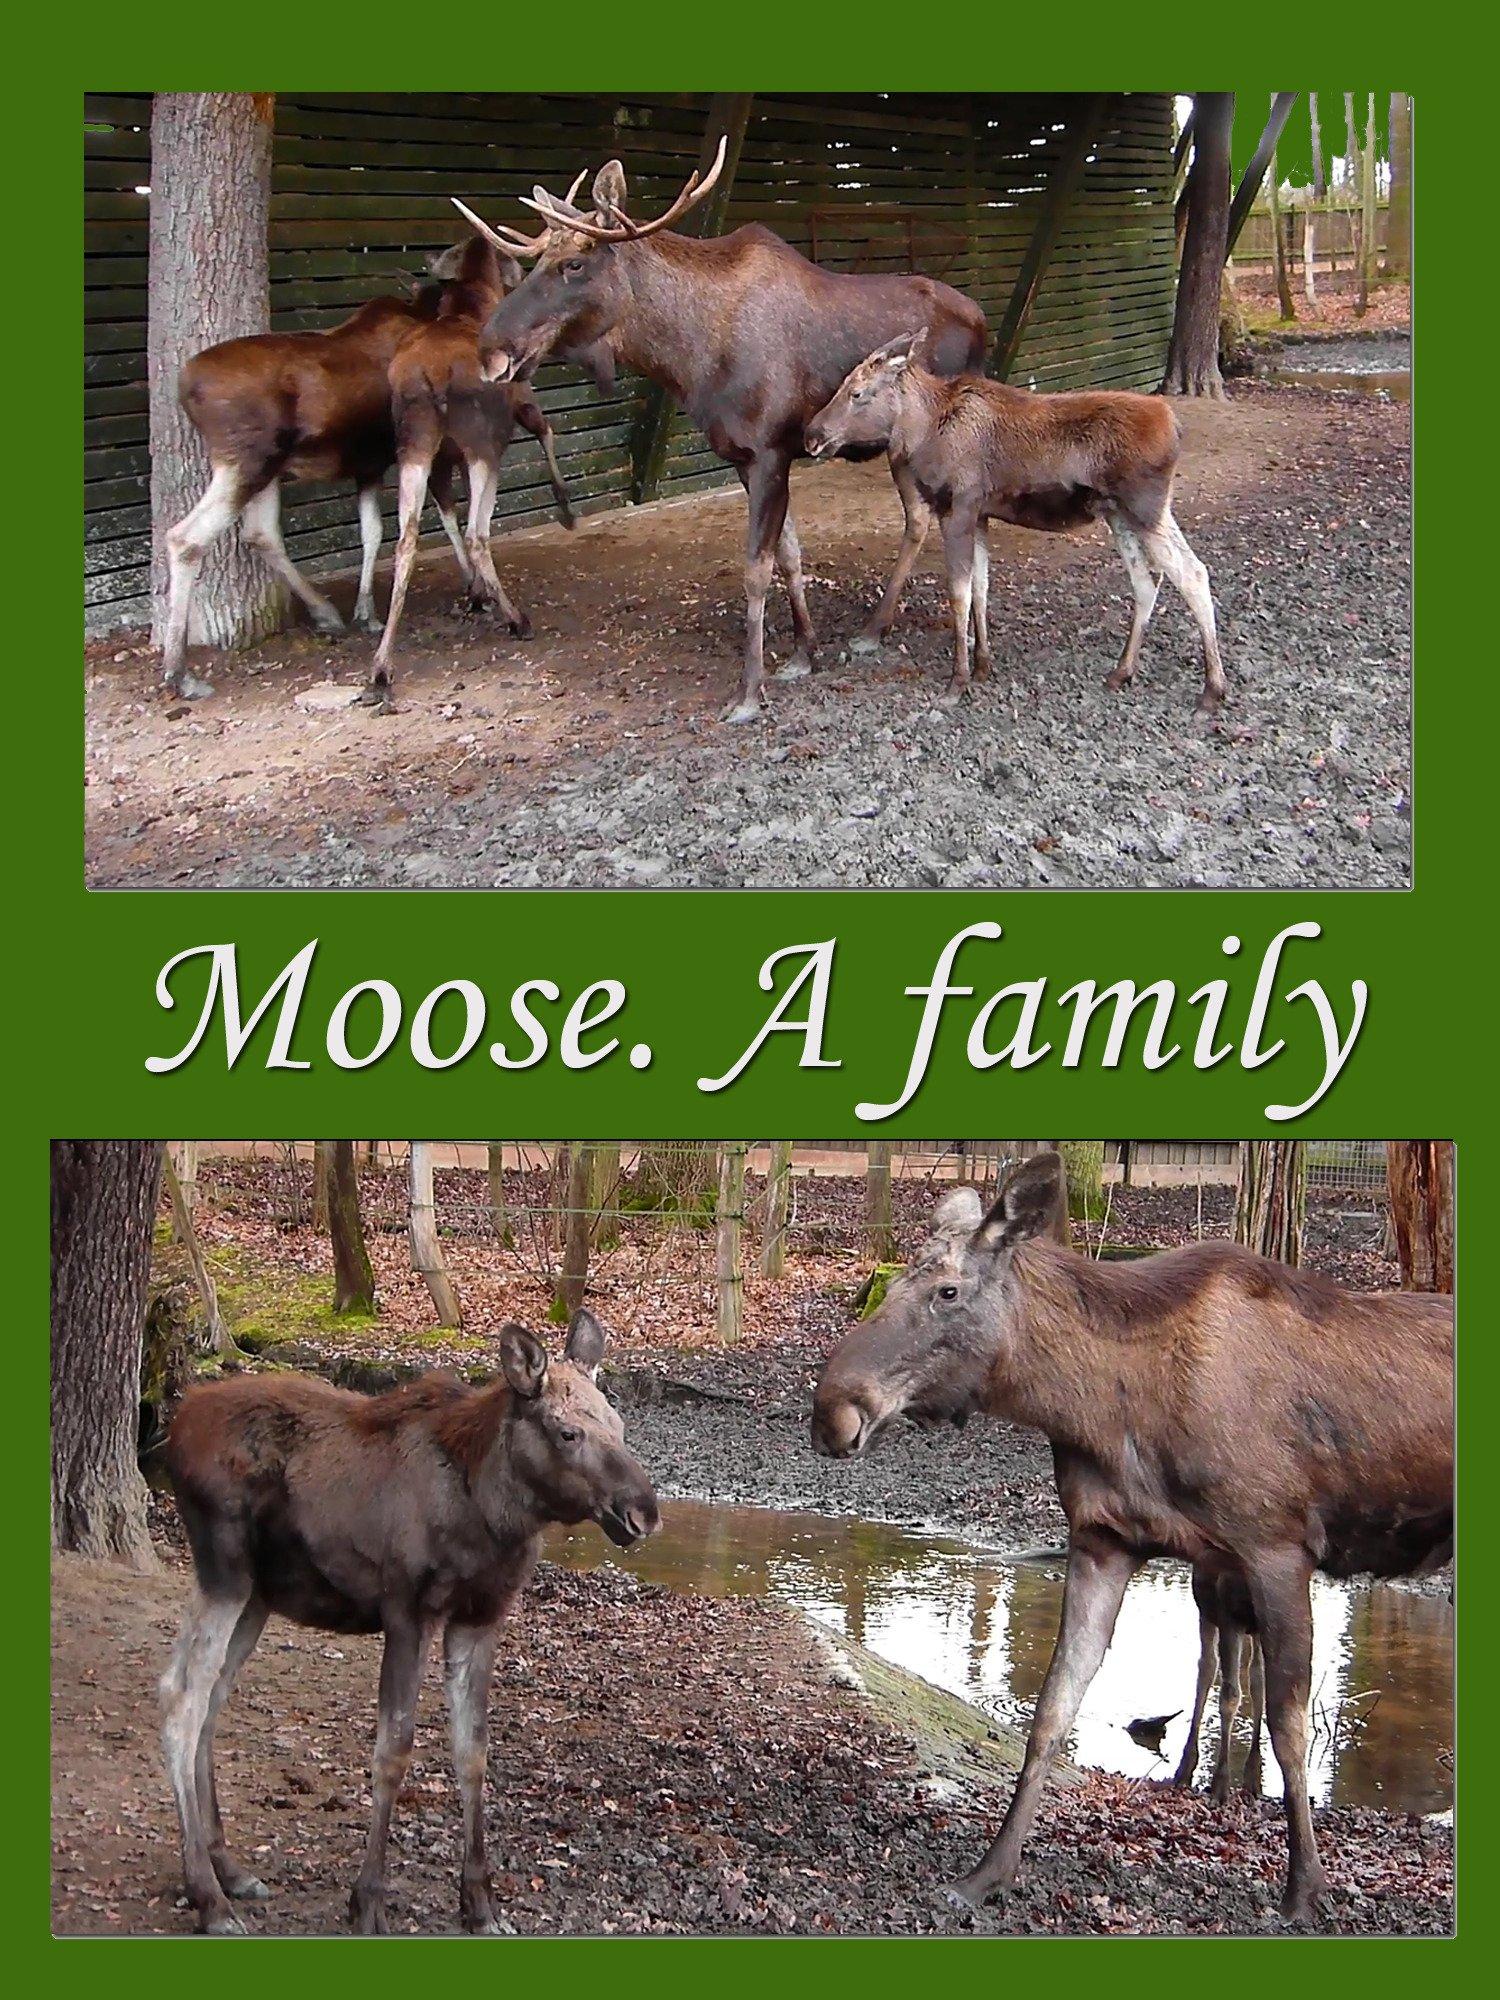 Moose. A family